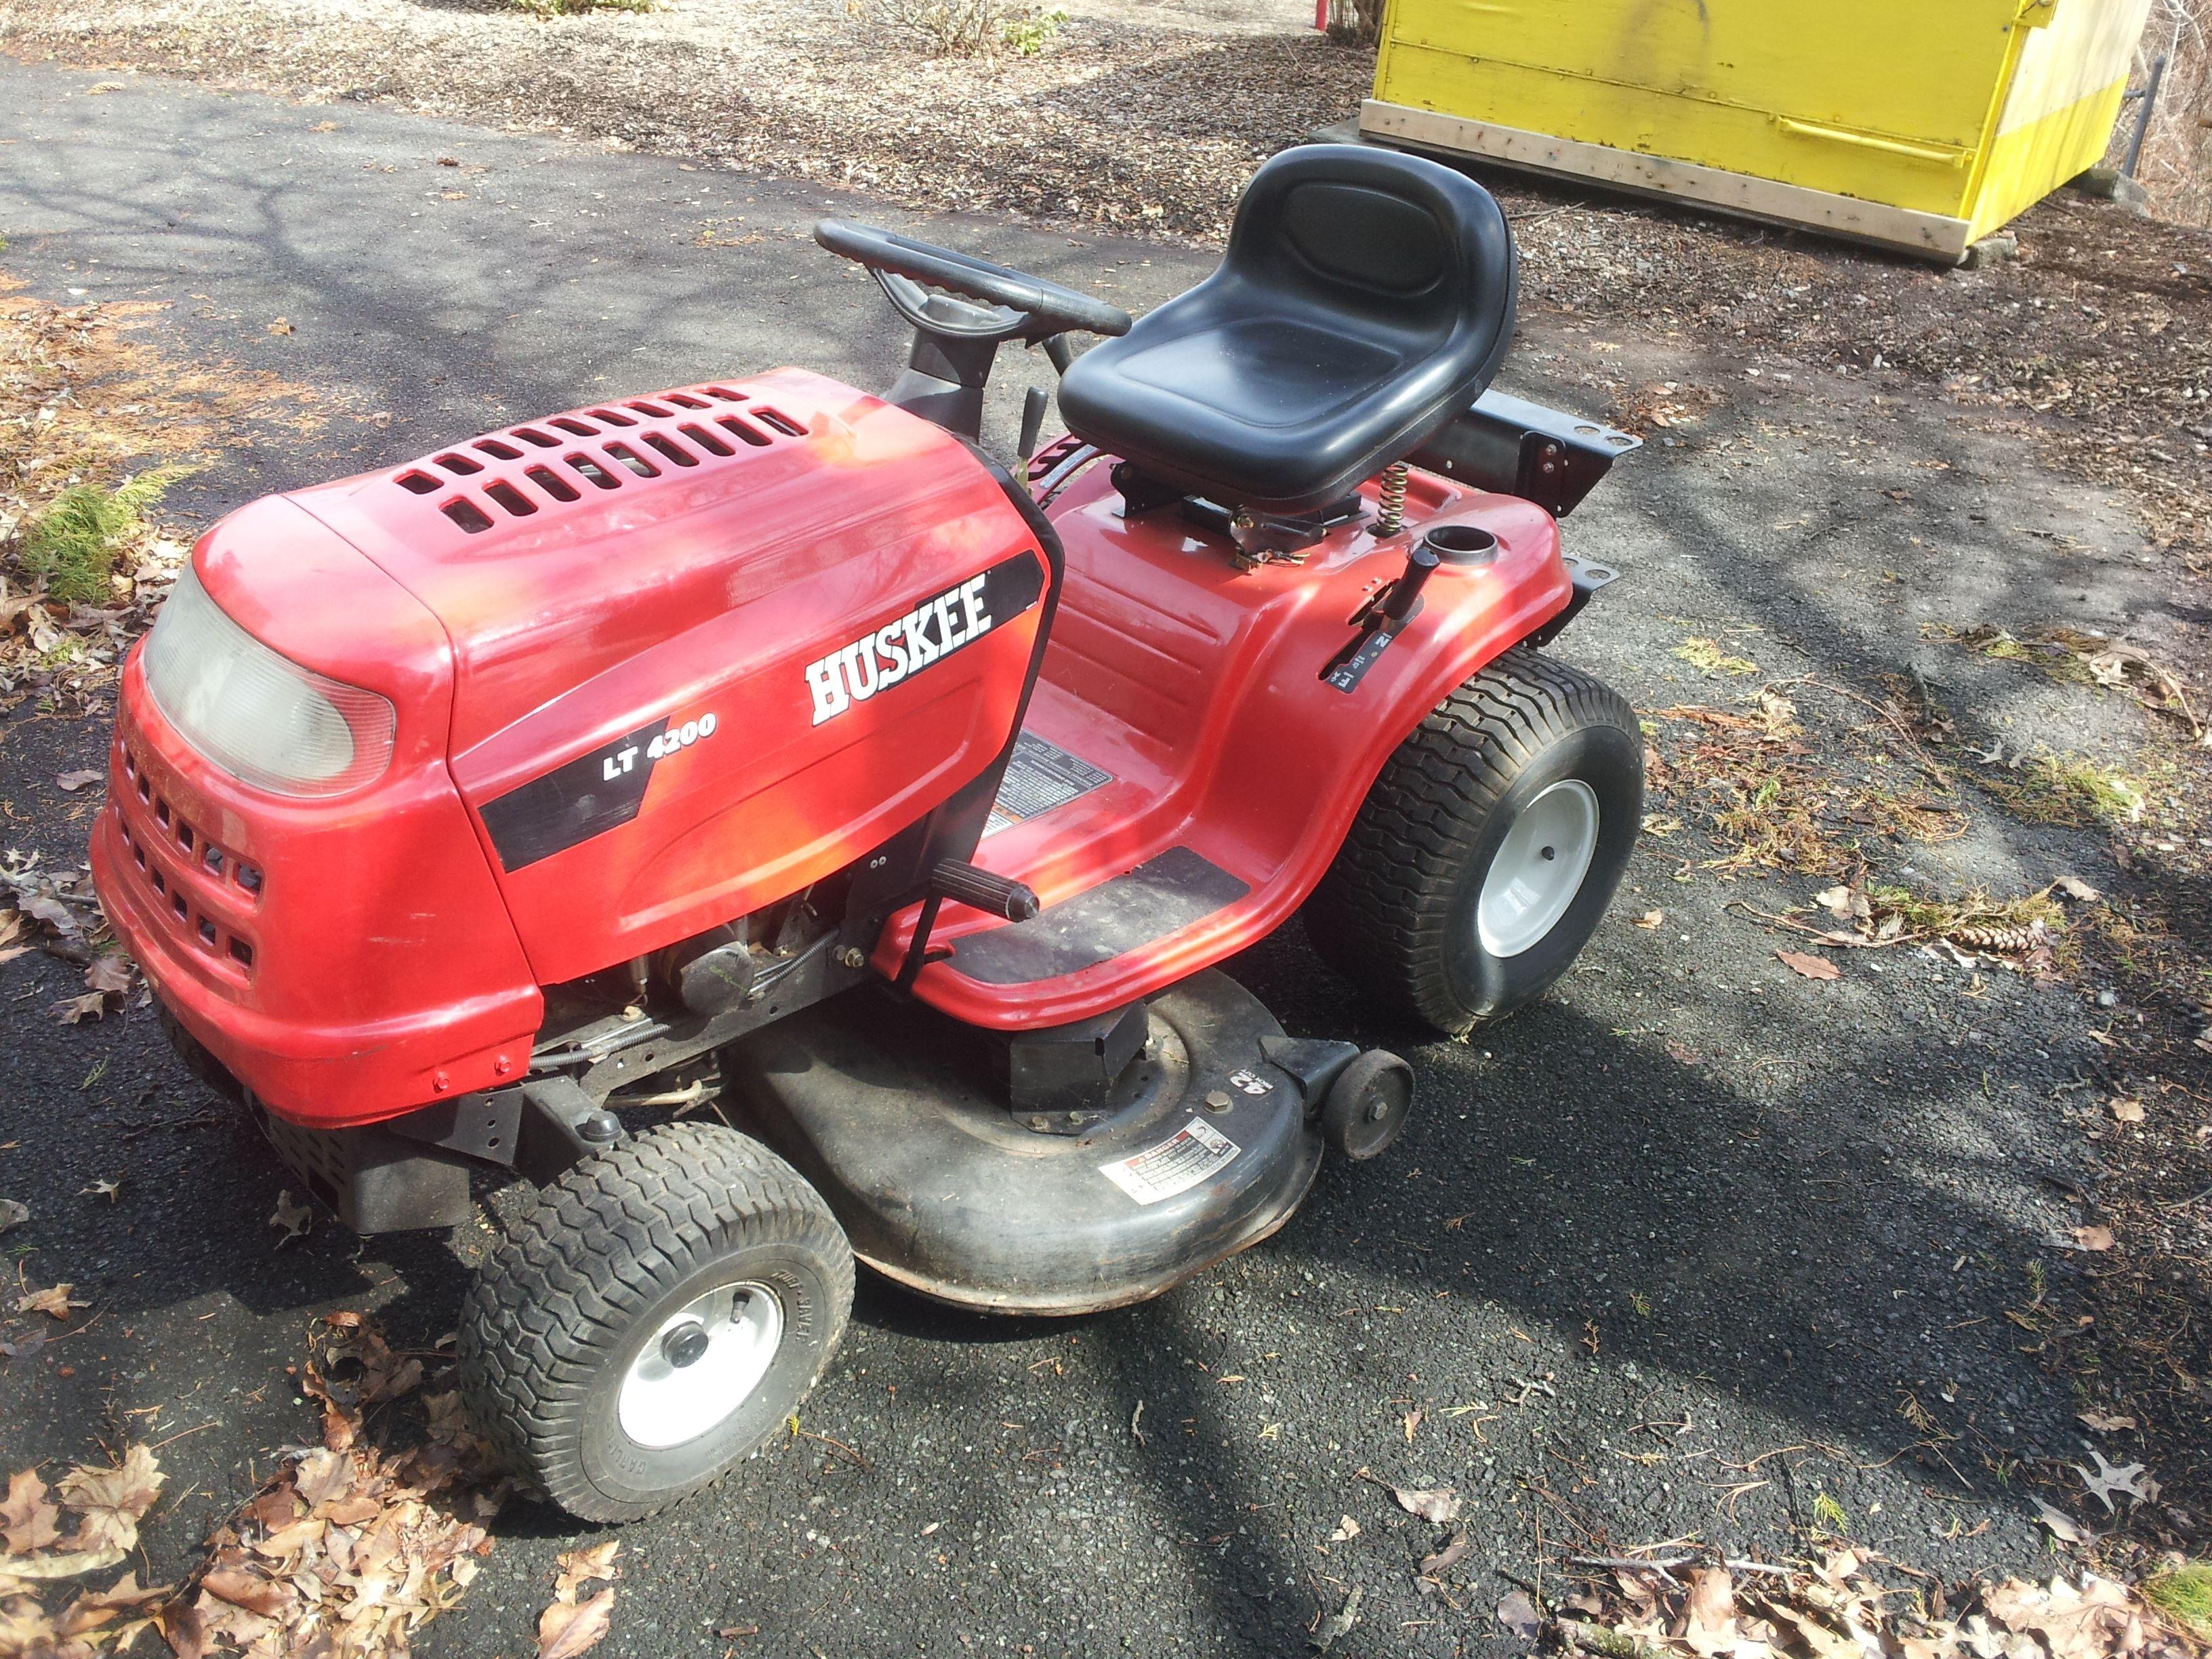 medium resolution of huskee lt 4200 riding mower for sale on municibid com